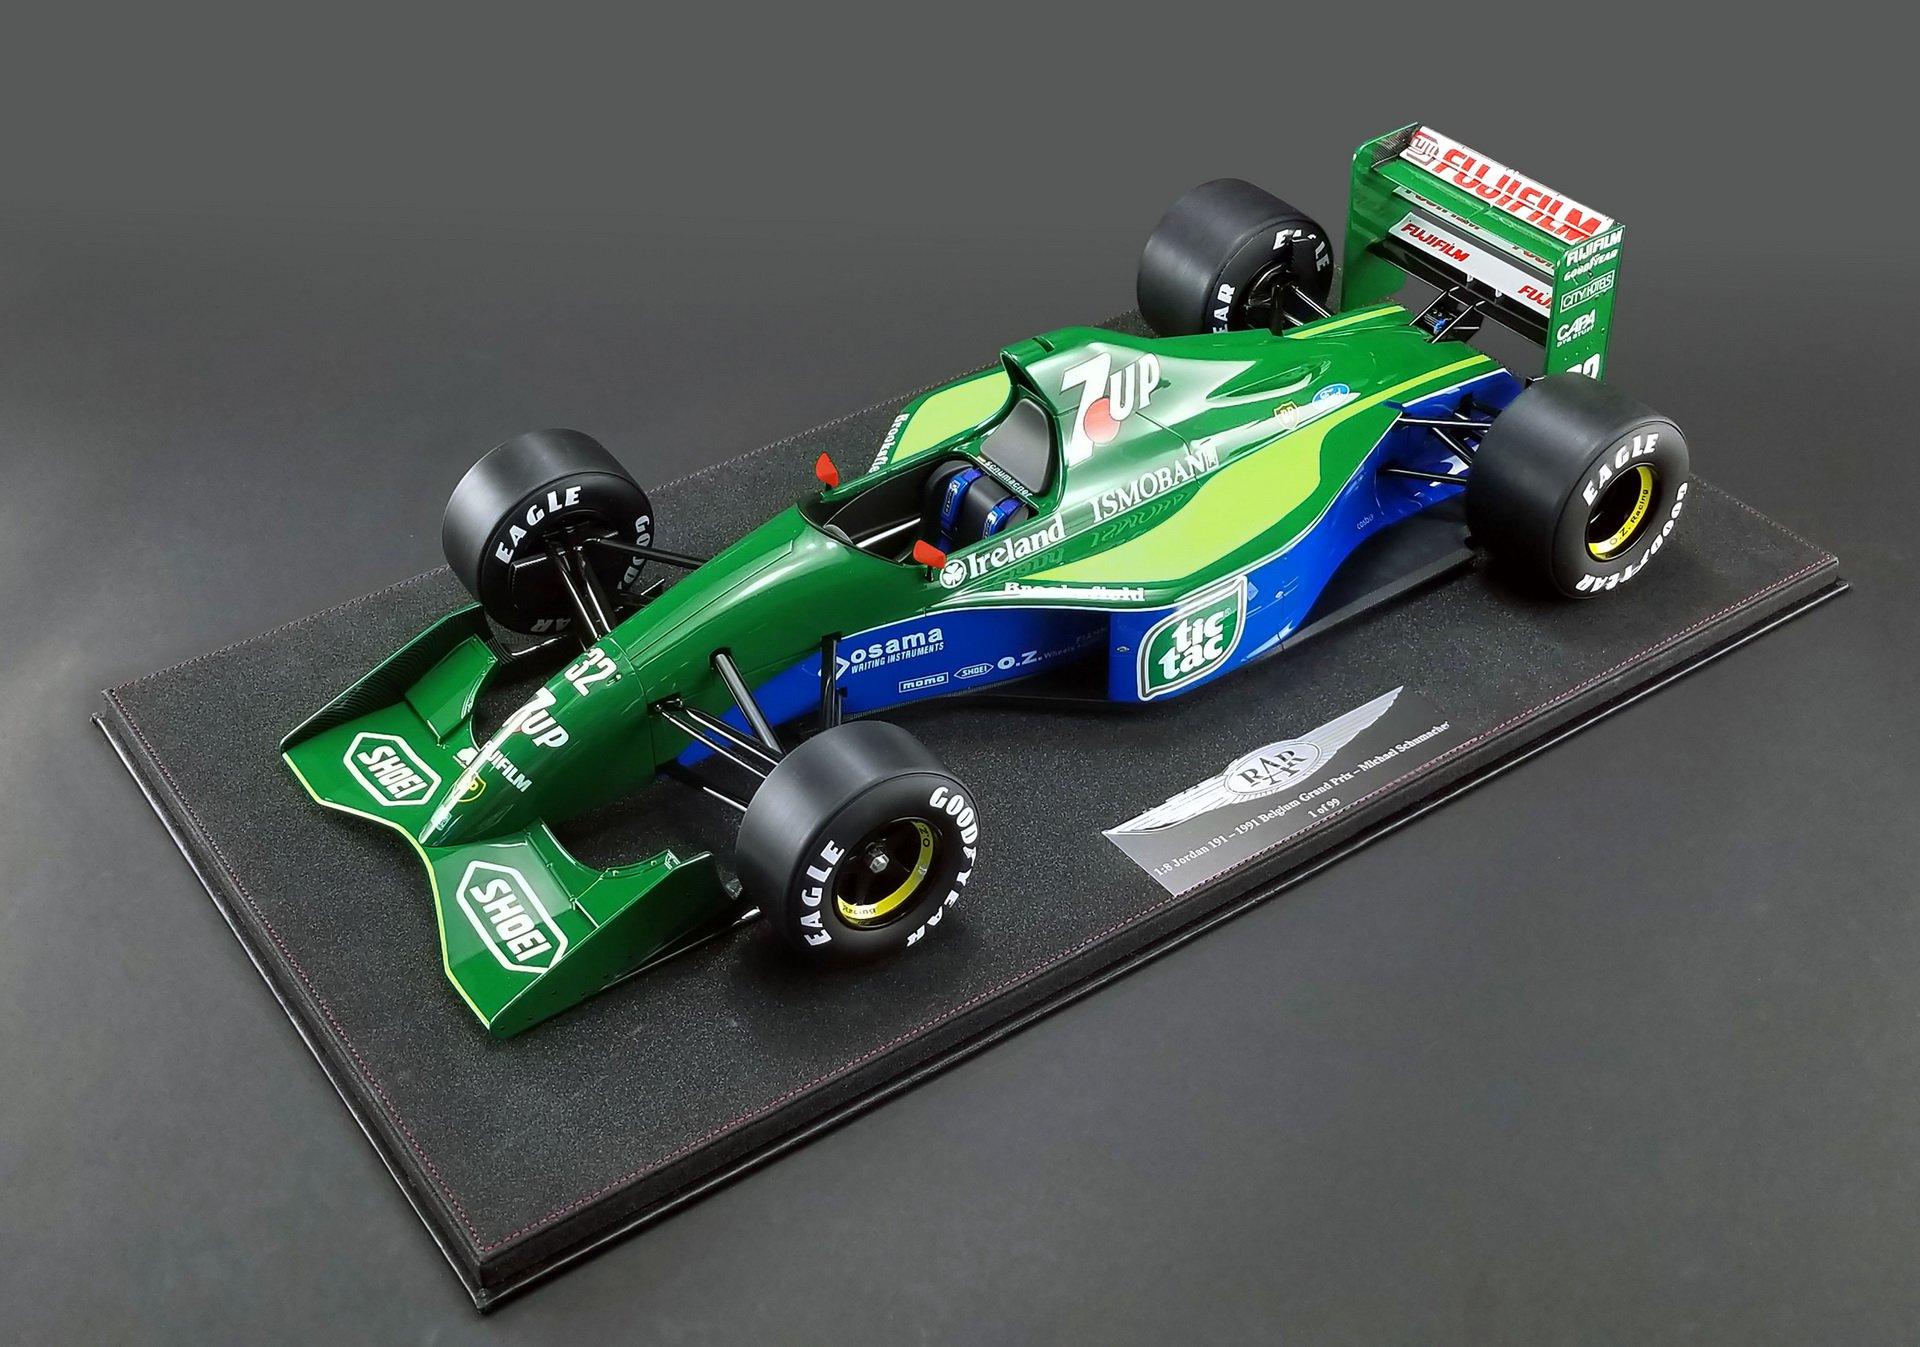 1991_Jordan_F1_car_Schumacher_scale_0000